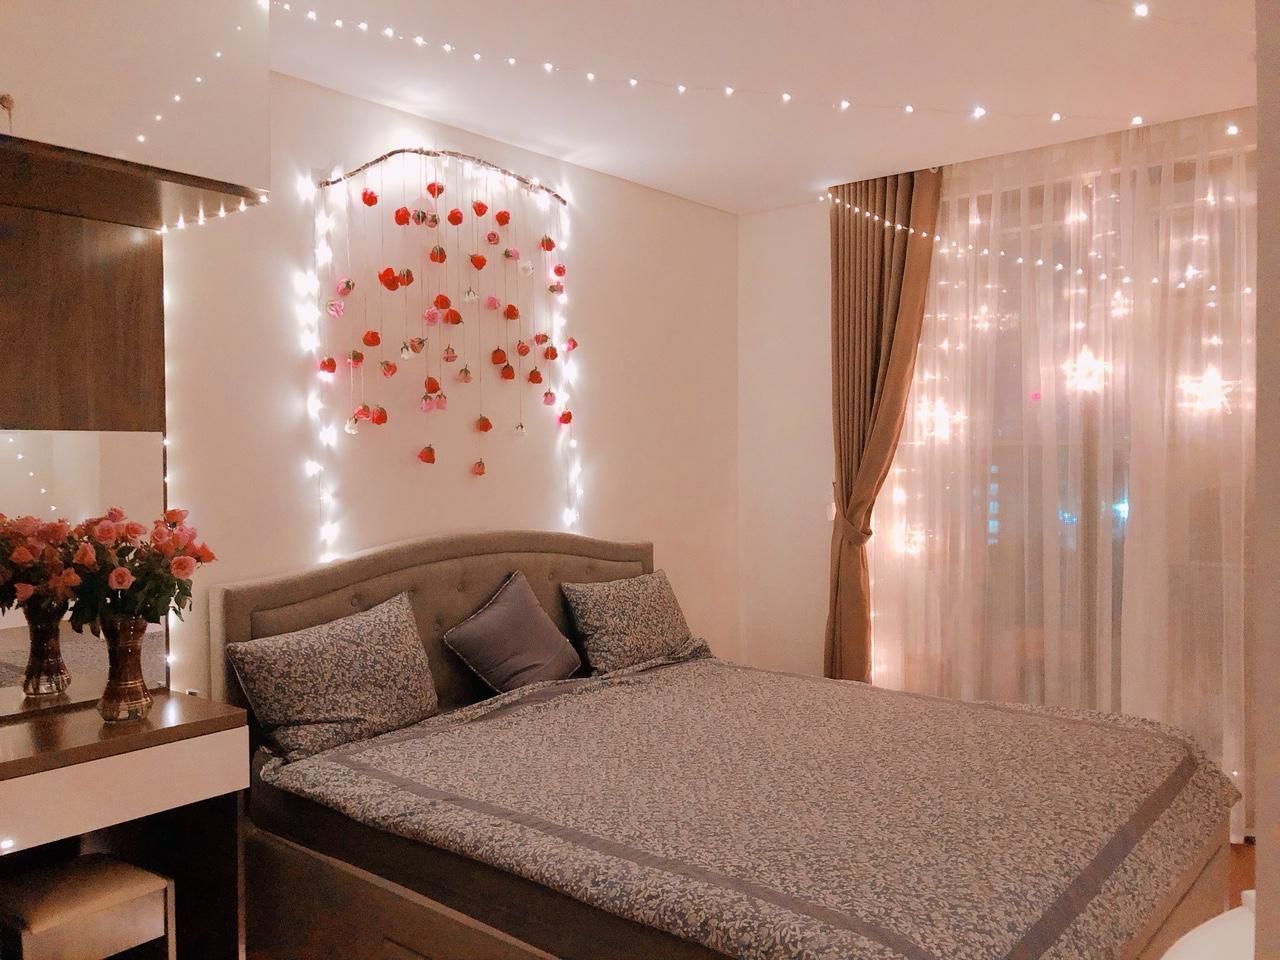 Bella Room Cau Giay Street